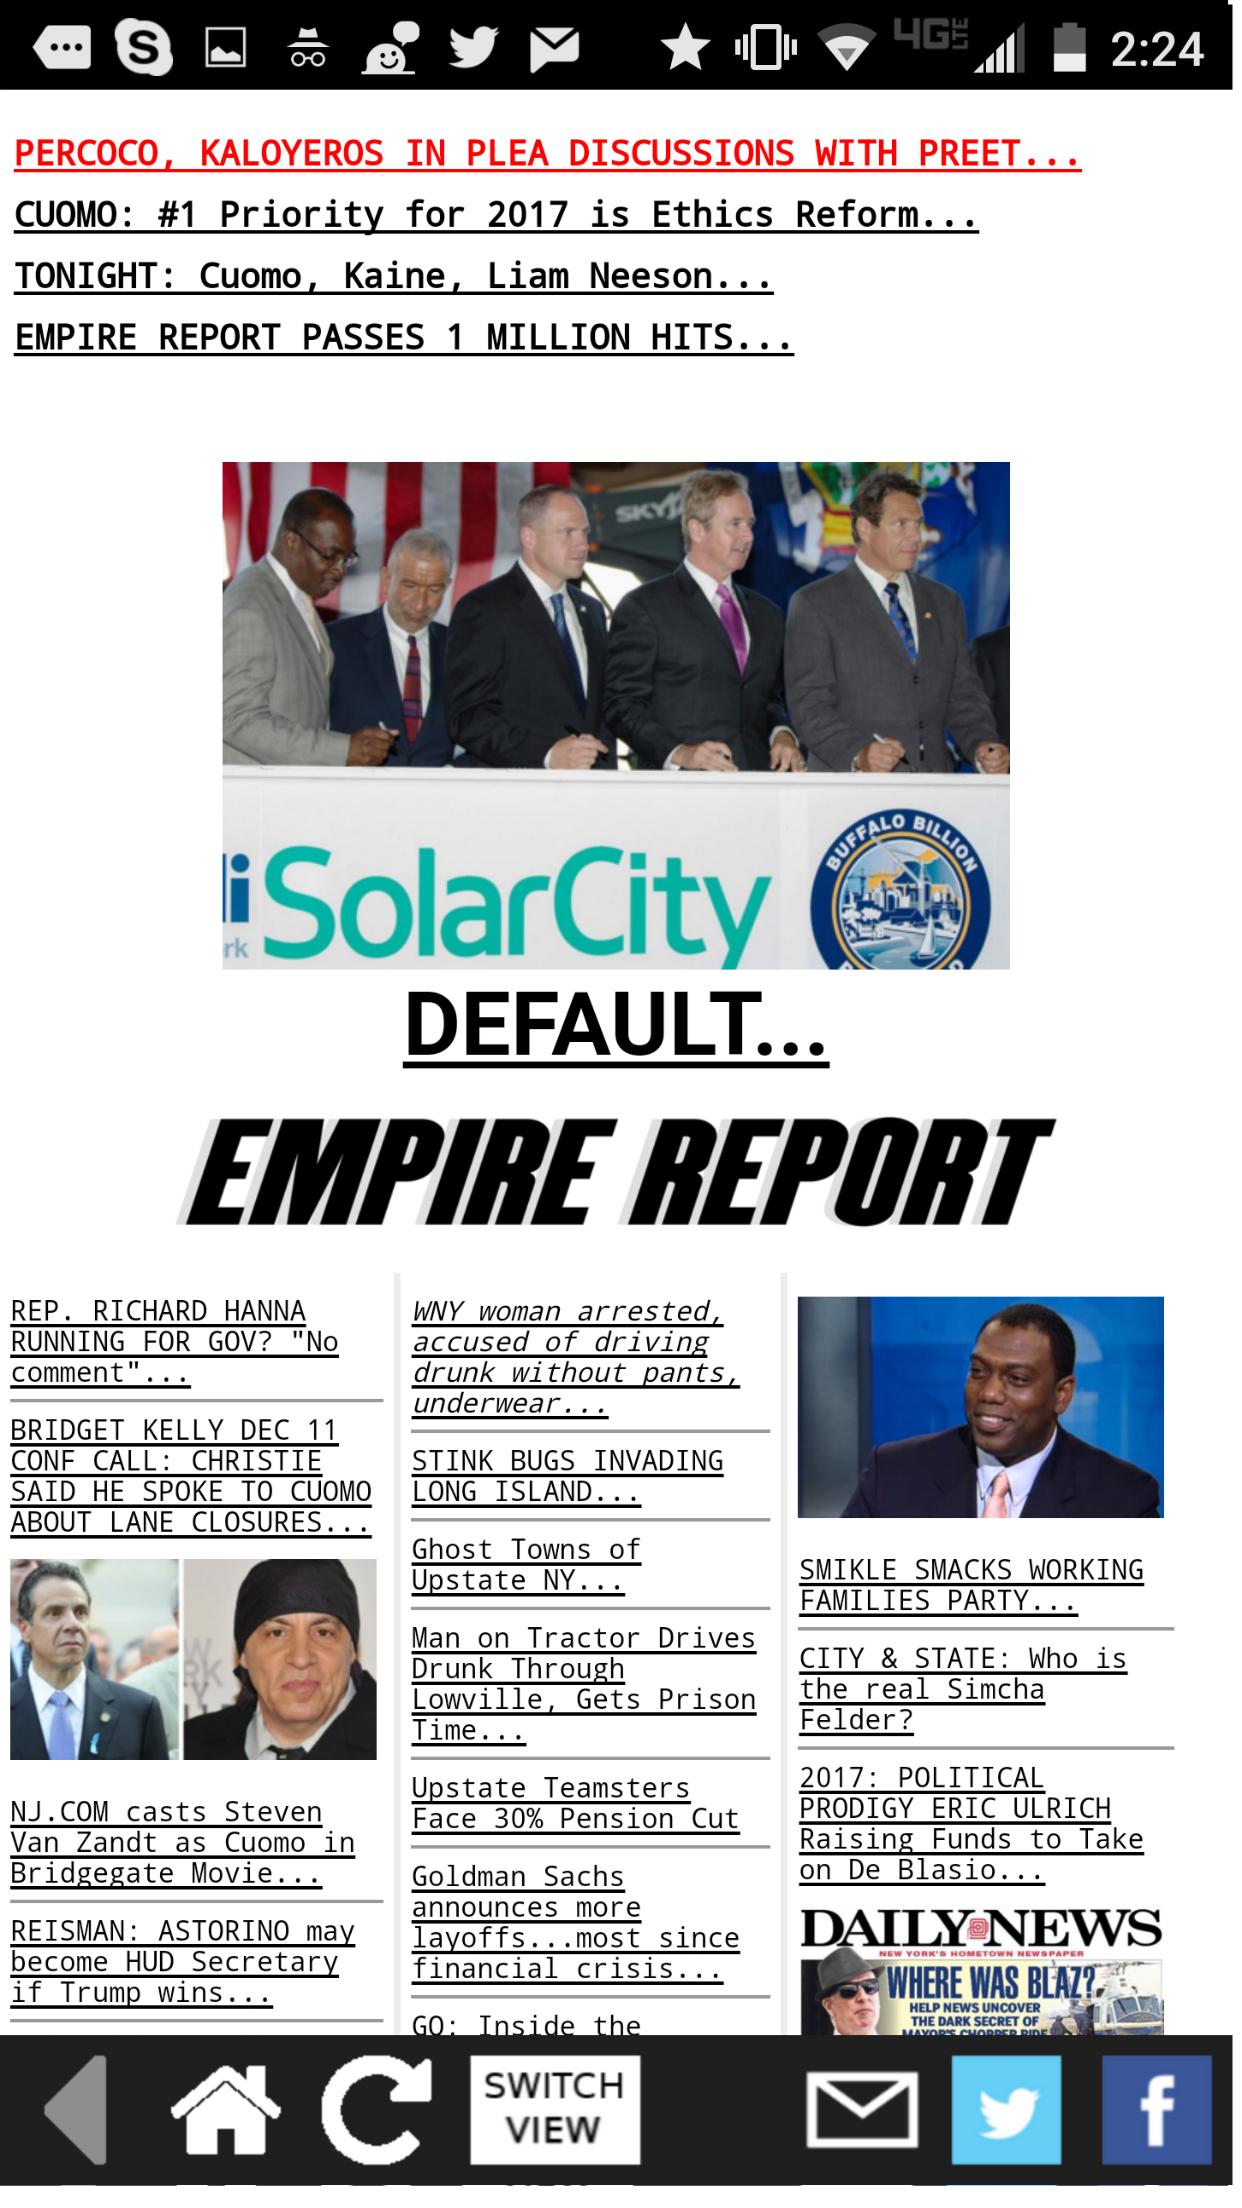 The Empire Report Screenshot